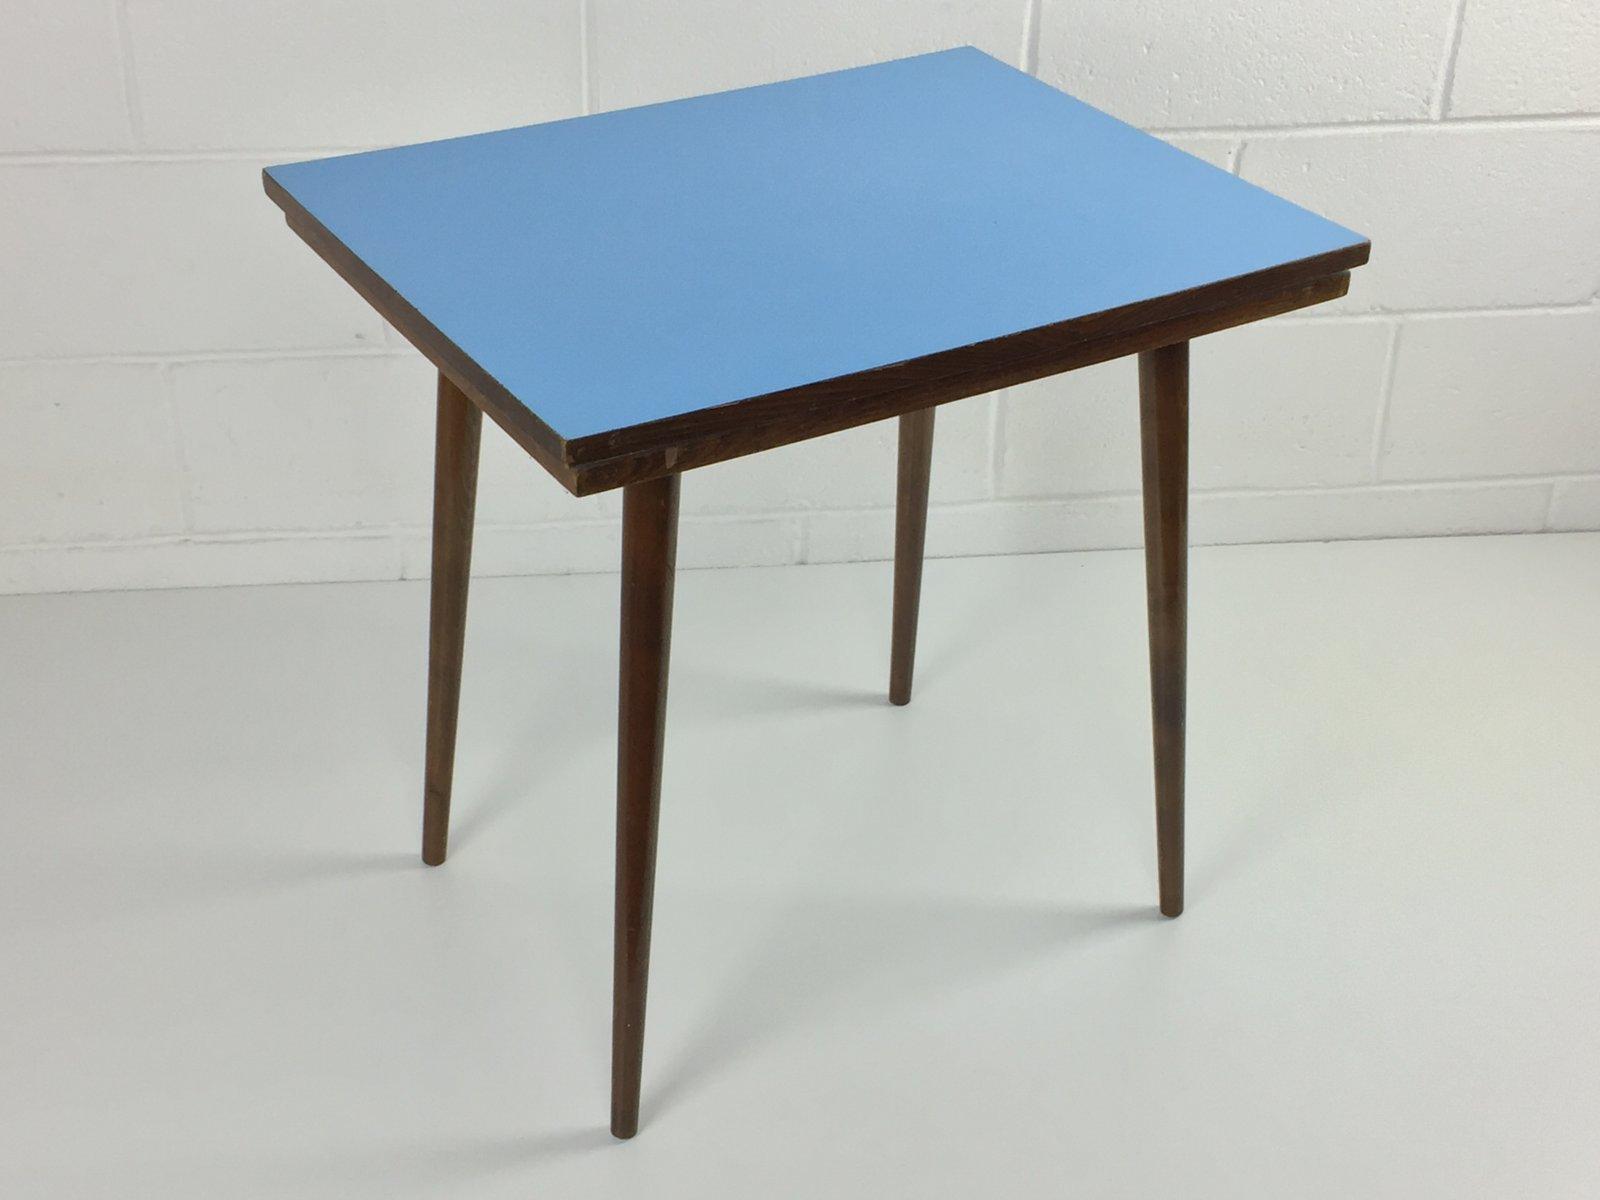 table basse mid century en h tre formica bleu de tatra nabytok r publique tch que en vente. Black Bedroom Furniture Sets. Home Design Ideas